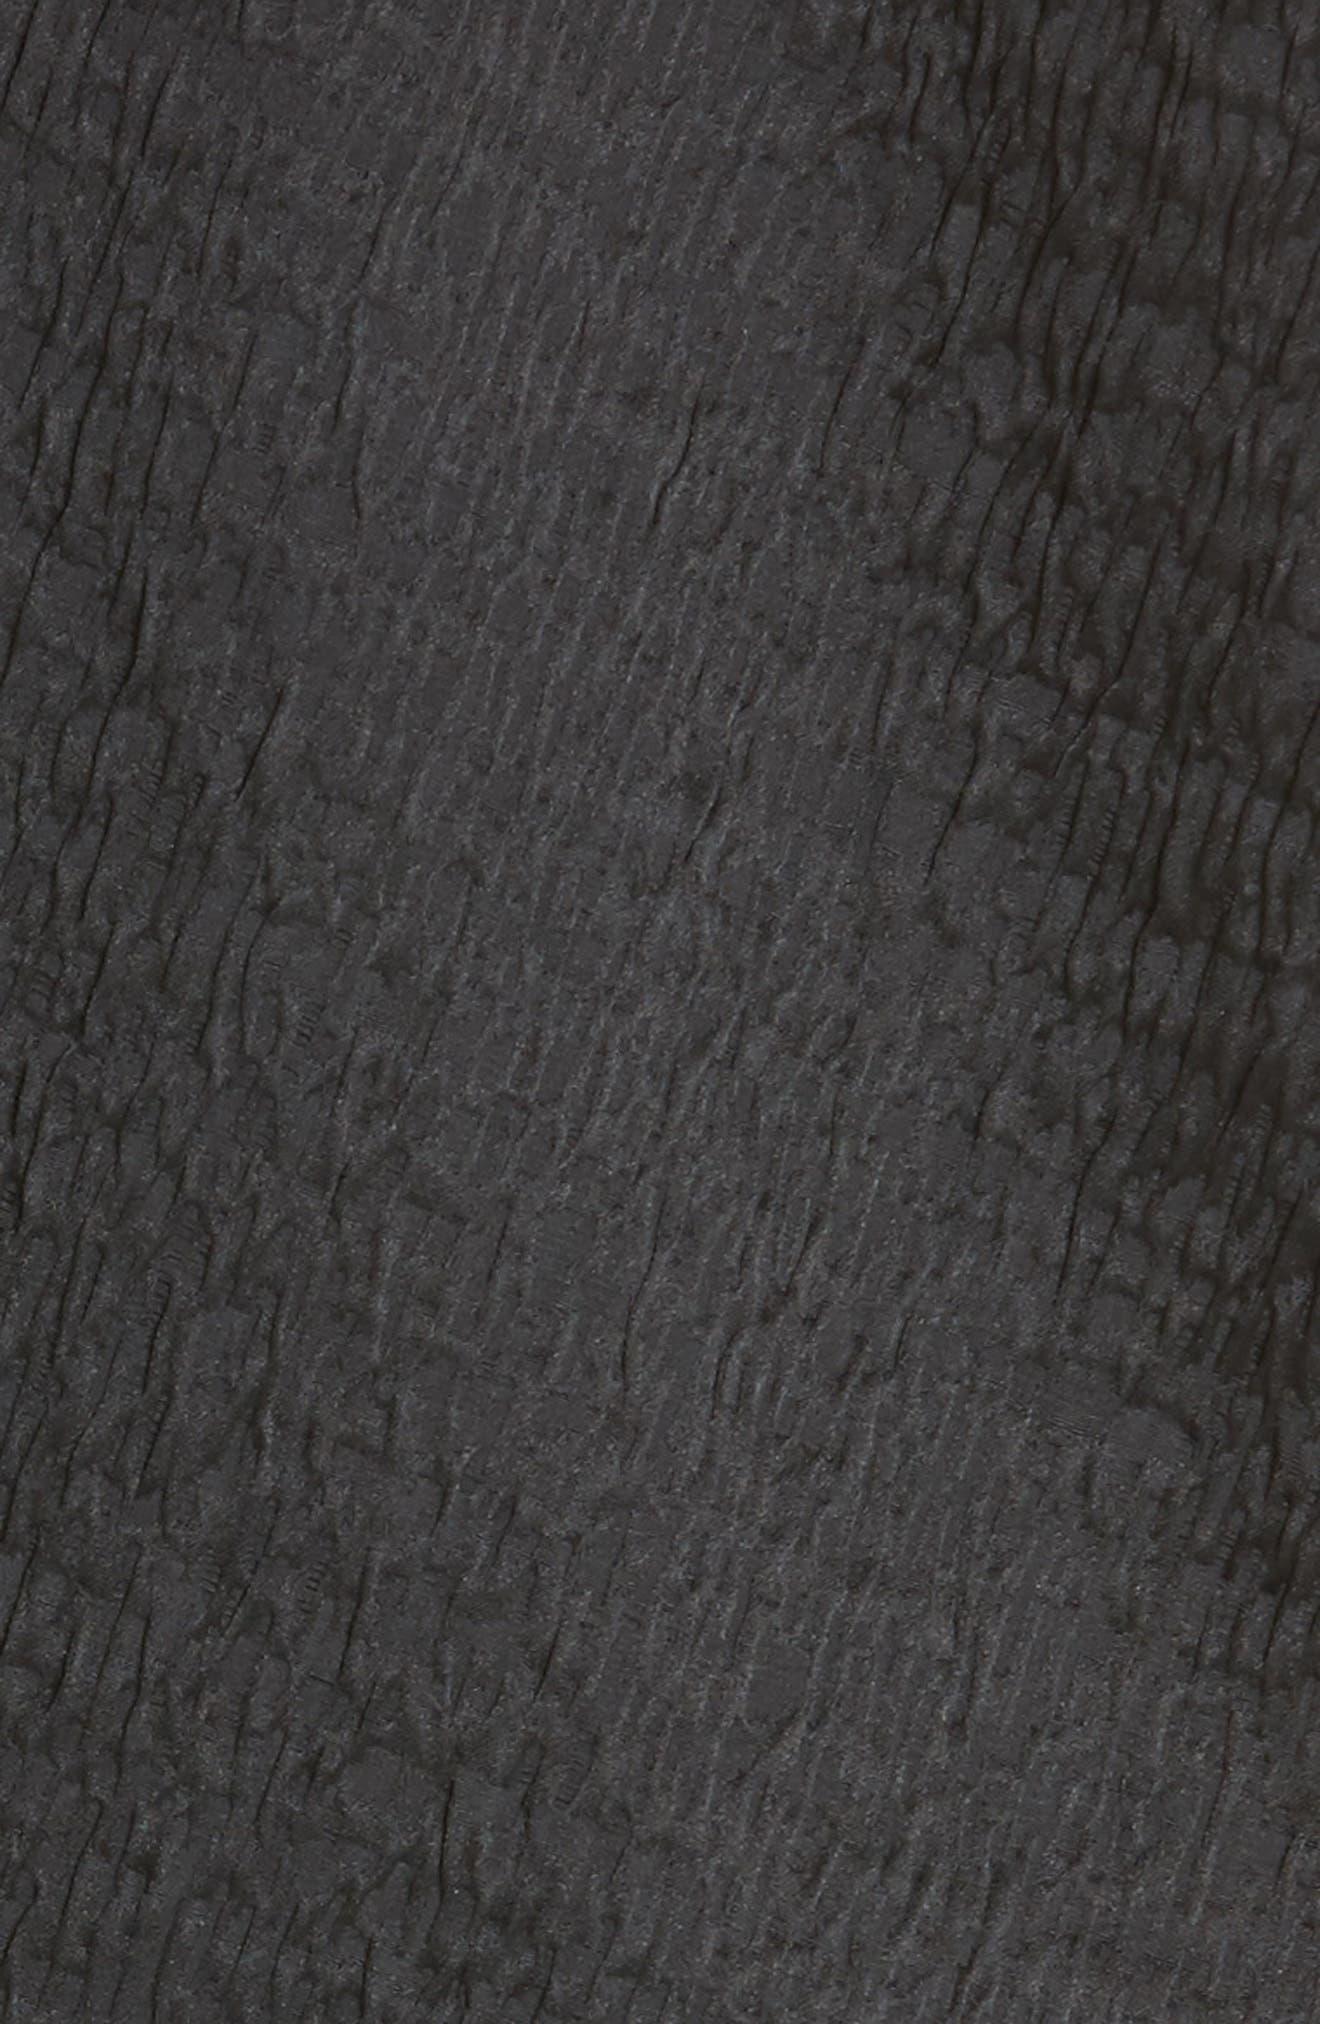 Koya Crinkle Stretch Coat,                             Alternate thumbnail 6, color,                             001